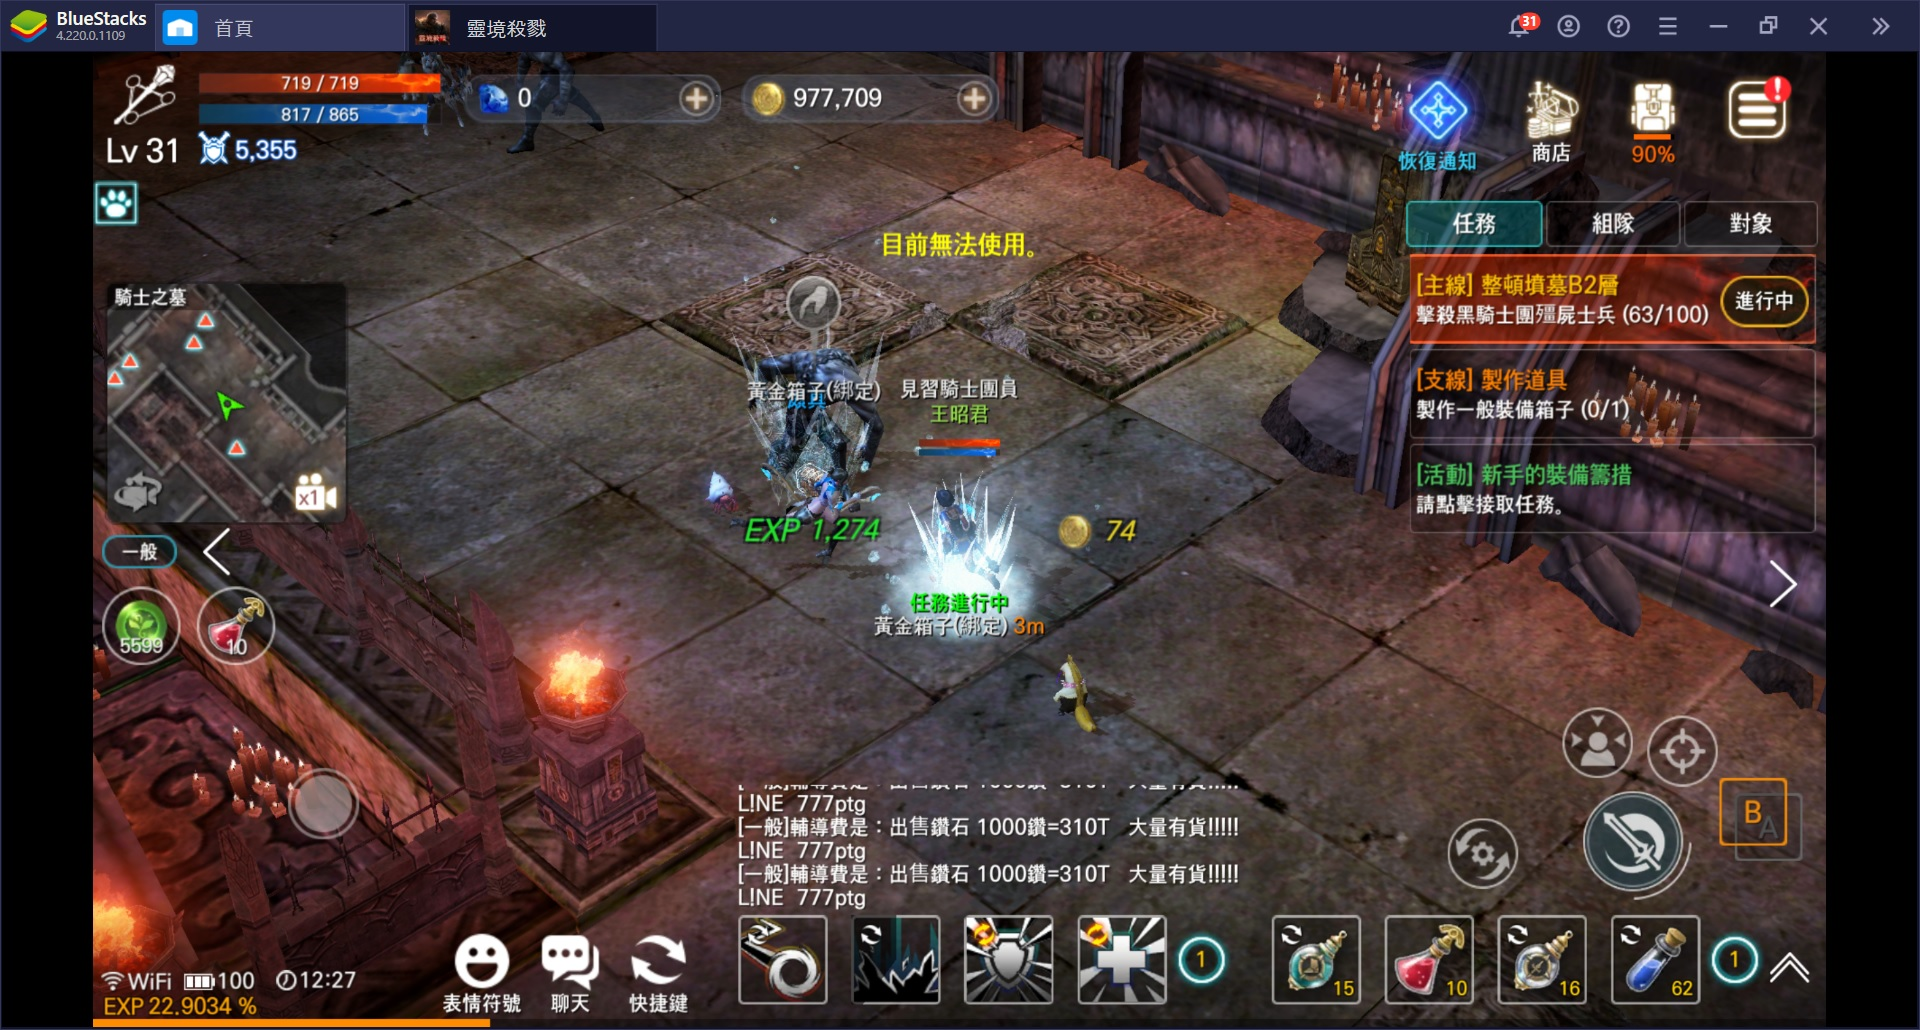 《EOS靈境殺戮》:新手必知的遊戲常識